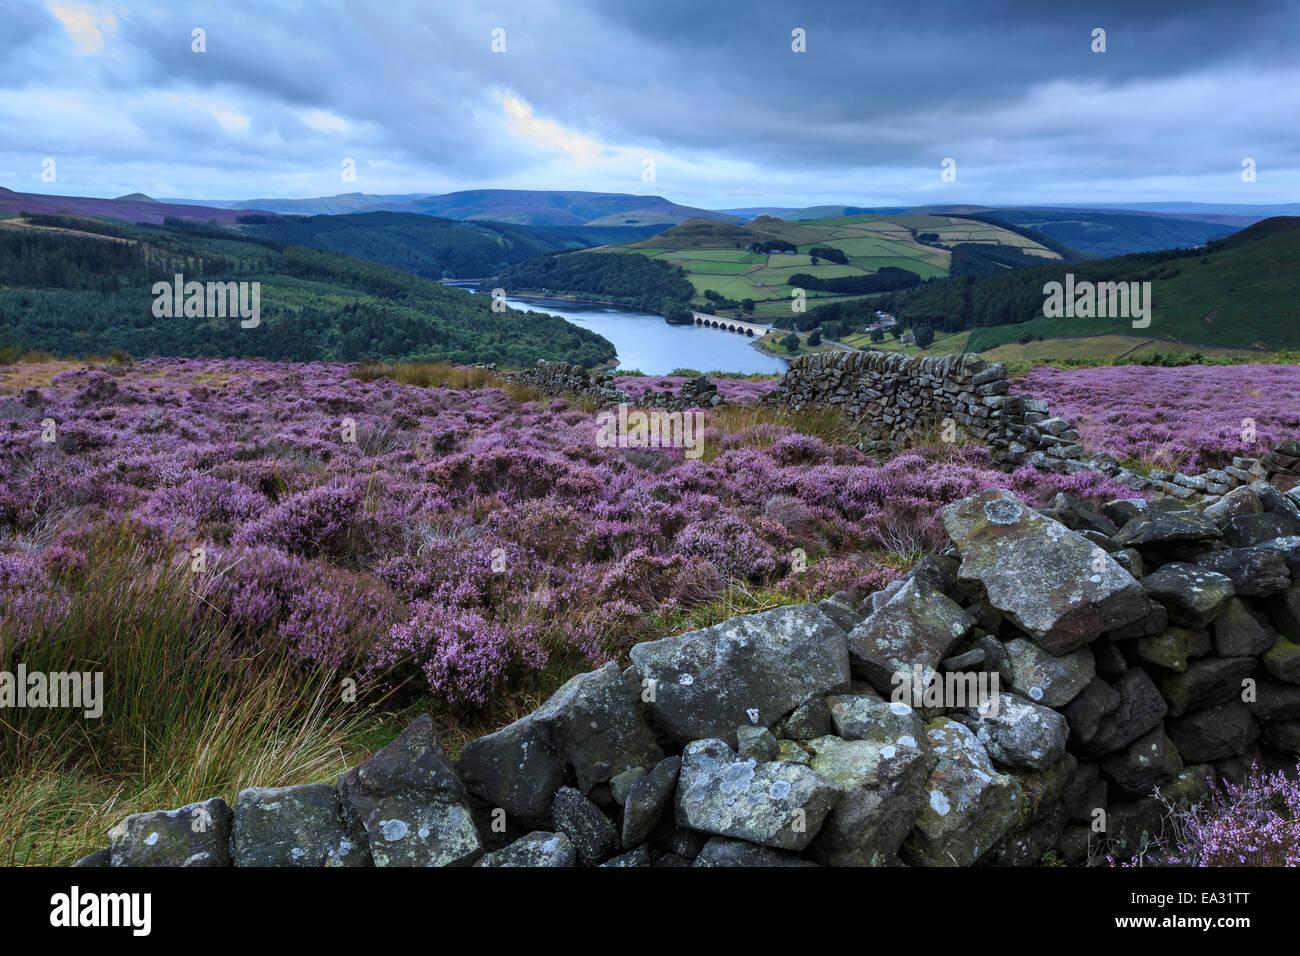 Heather covered Bamford Moor, Ladybower Reservoir and Ashopton Bridge at dawn in summer, Peak District, Derbyshire, - Stock Image